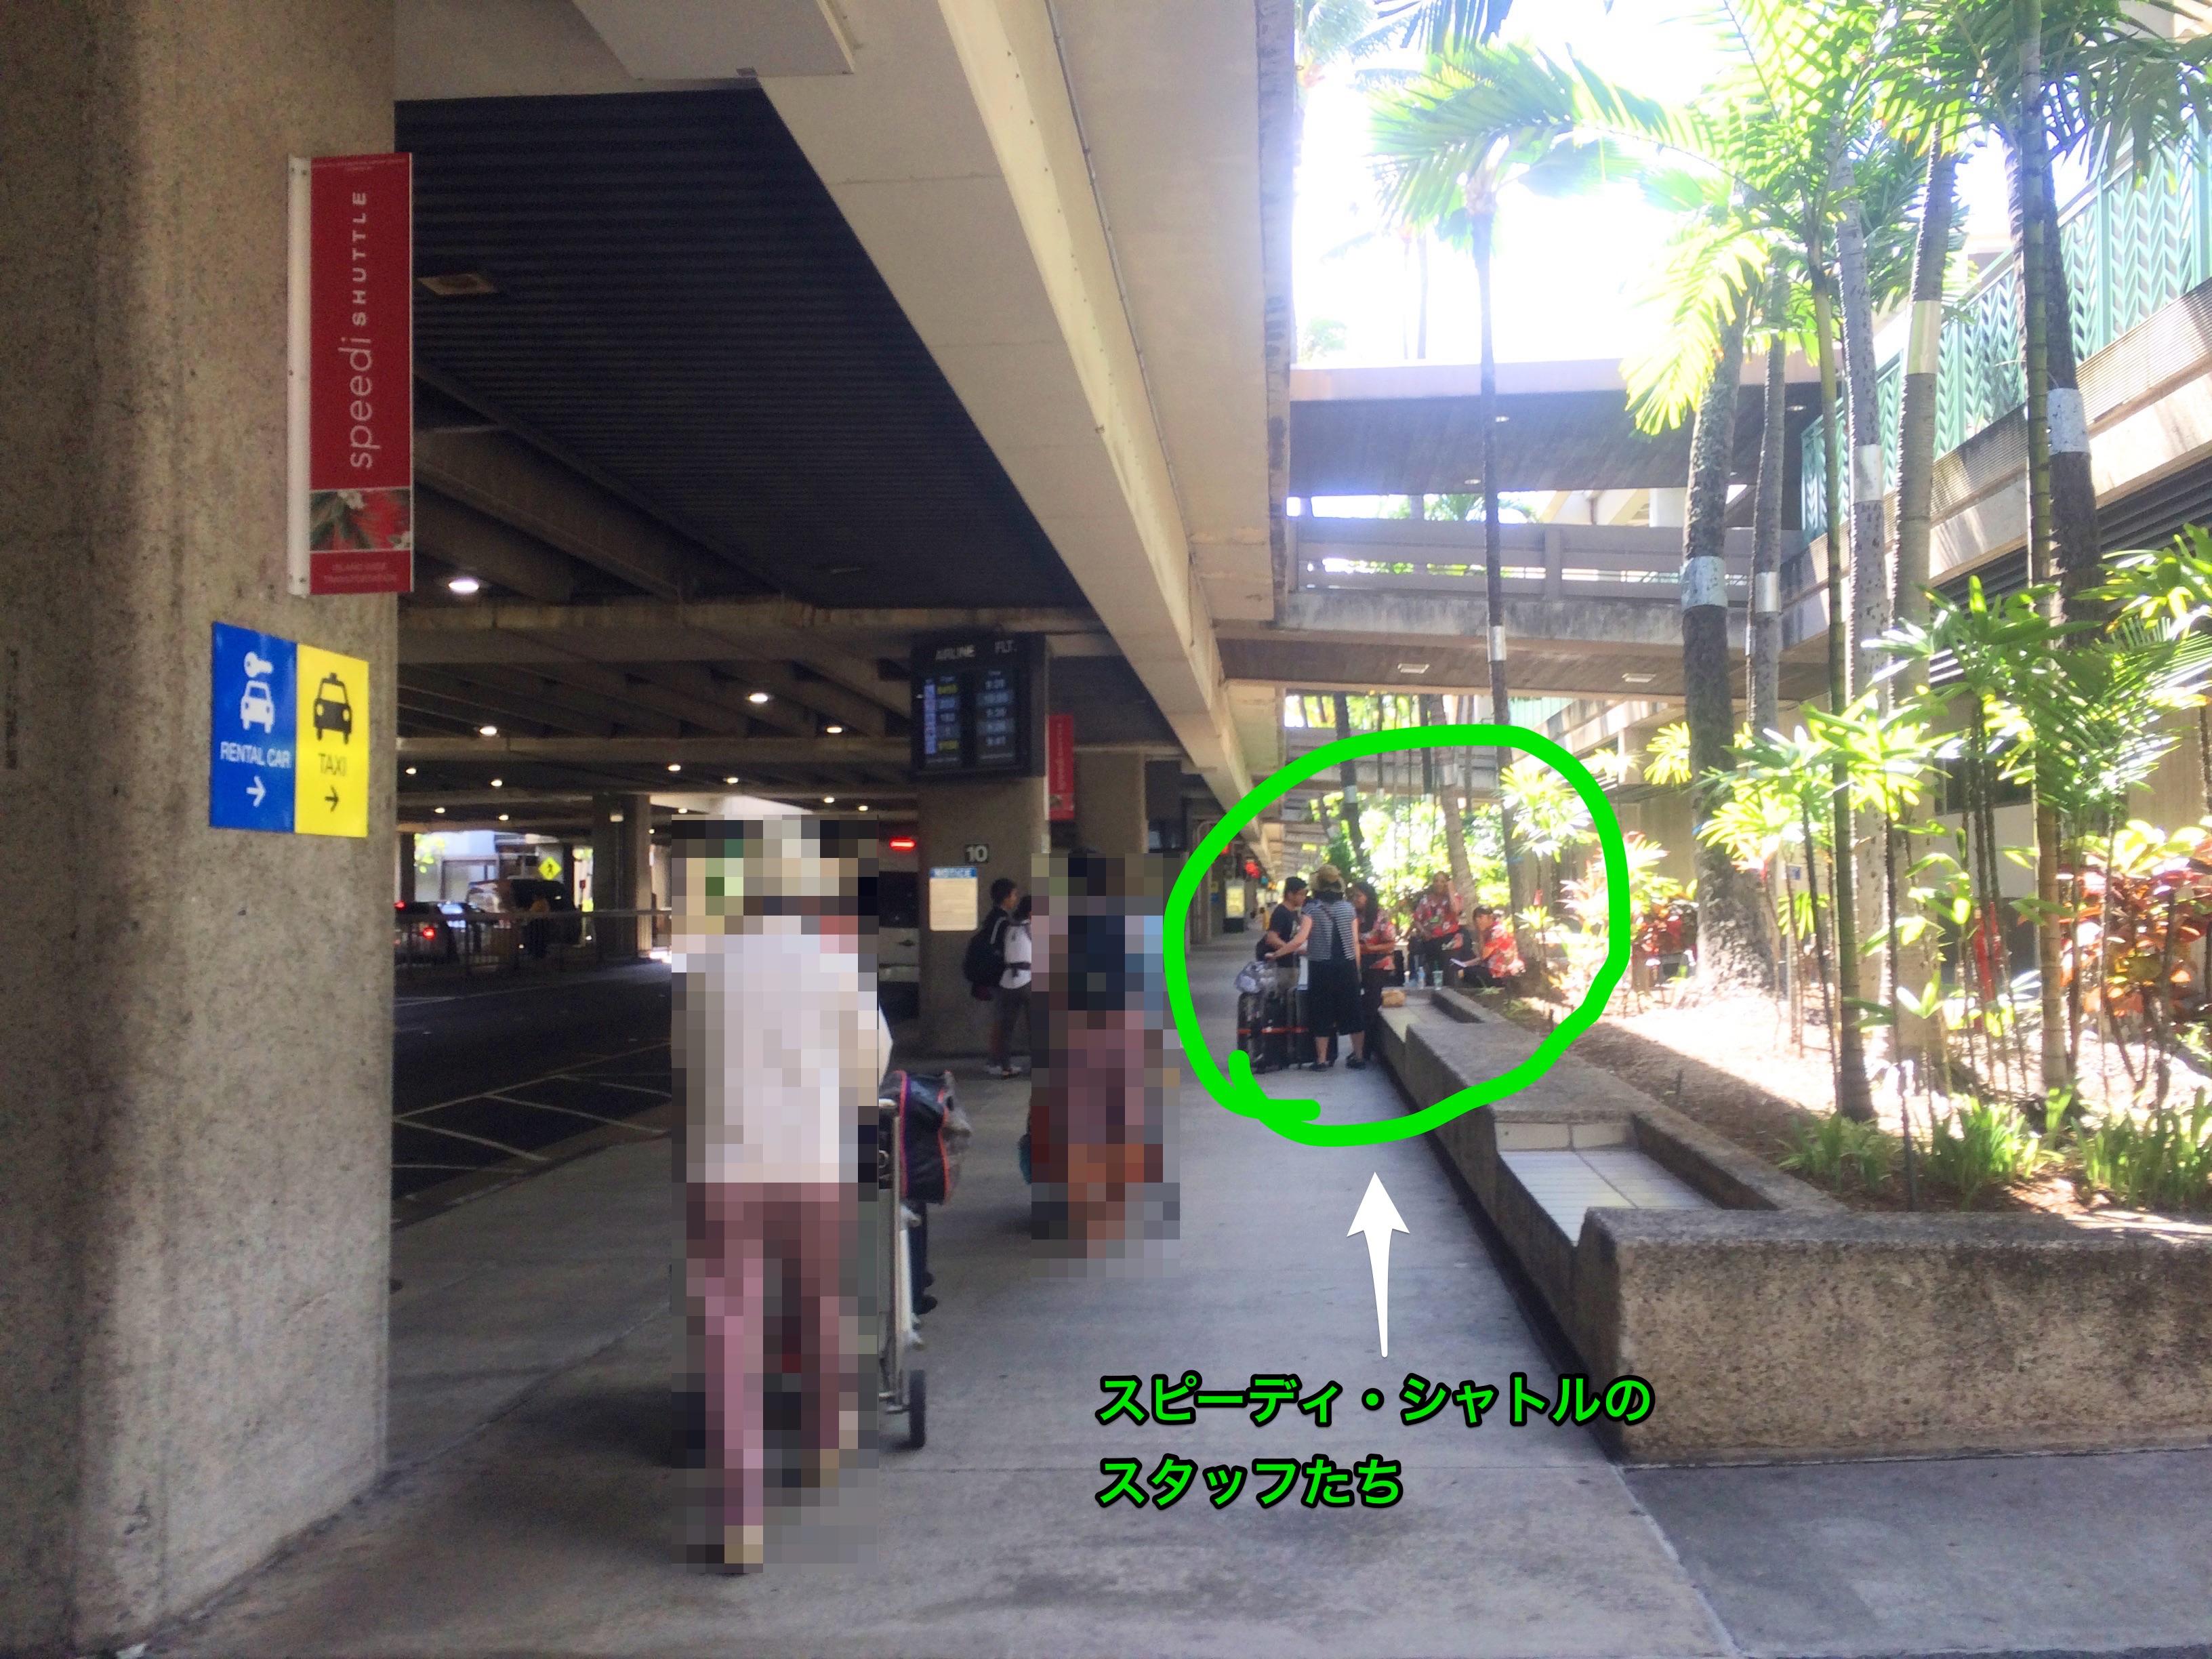 hawaii2016 ホノルル空港